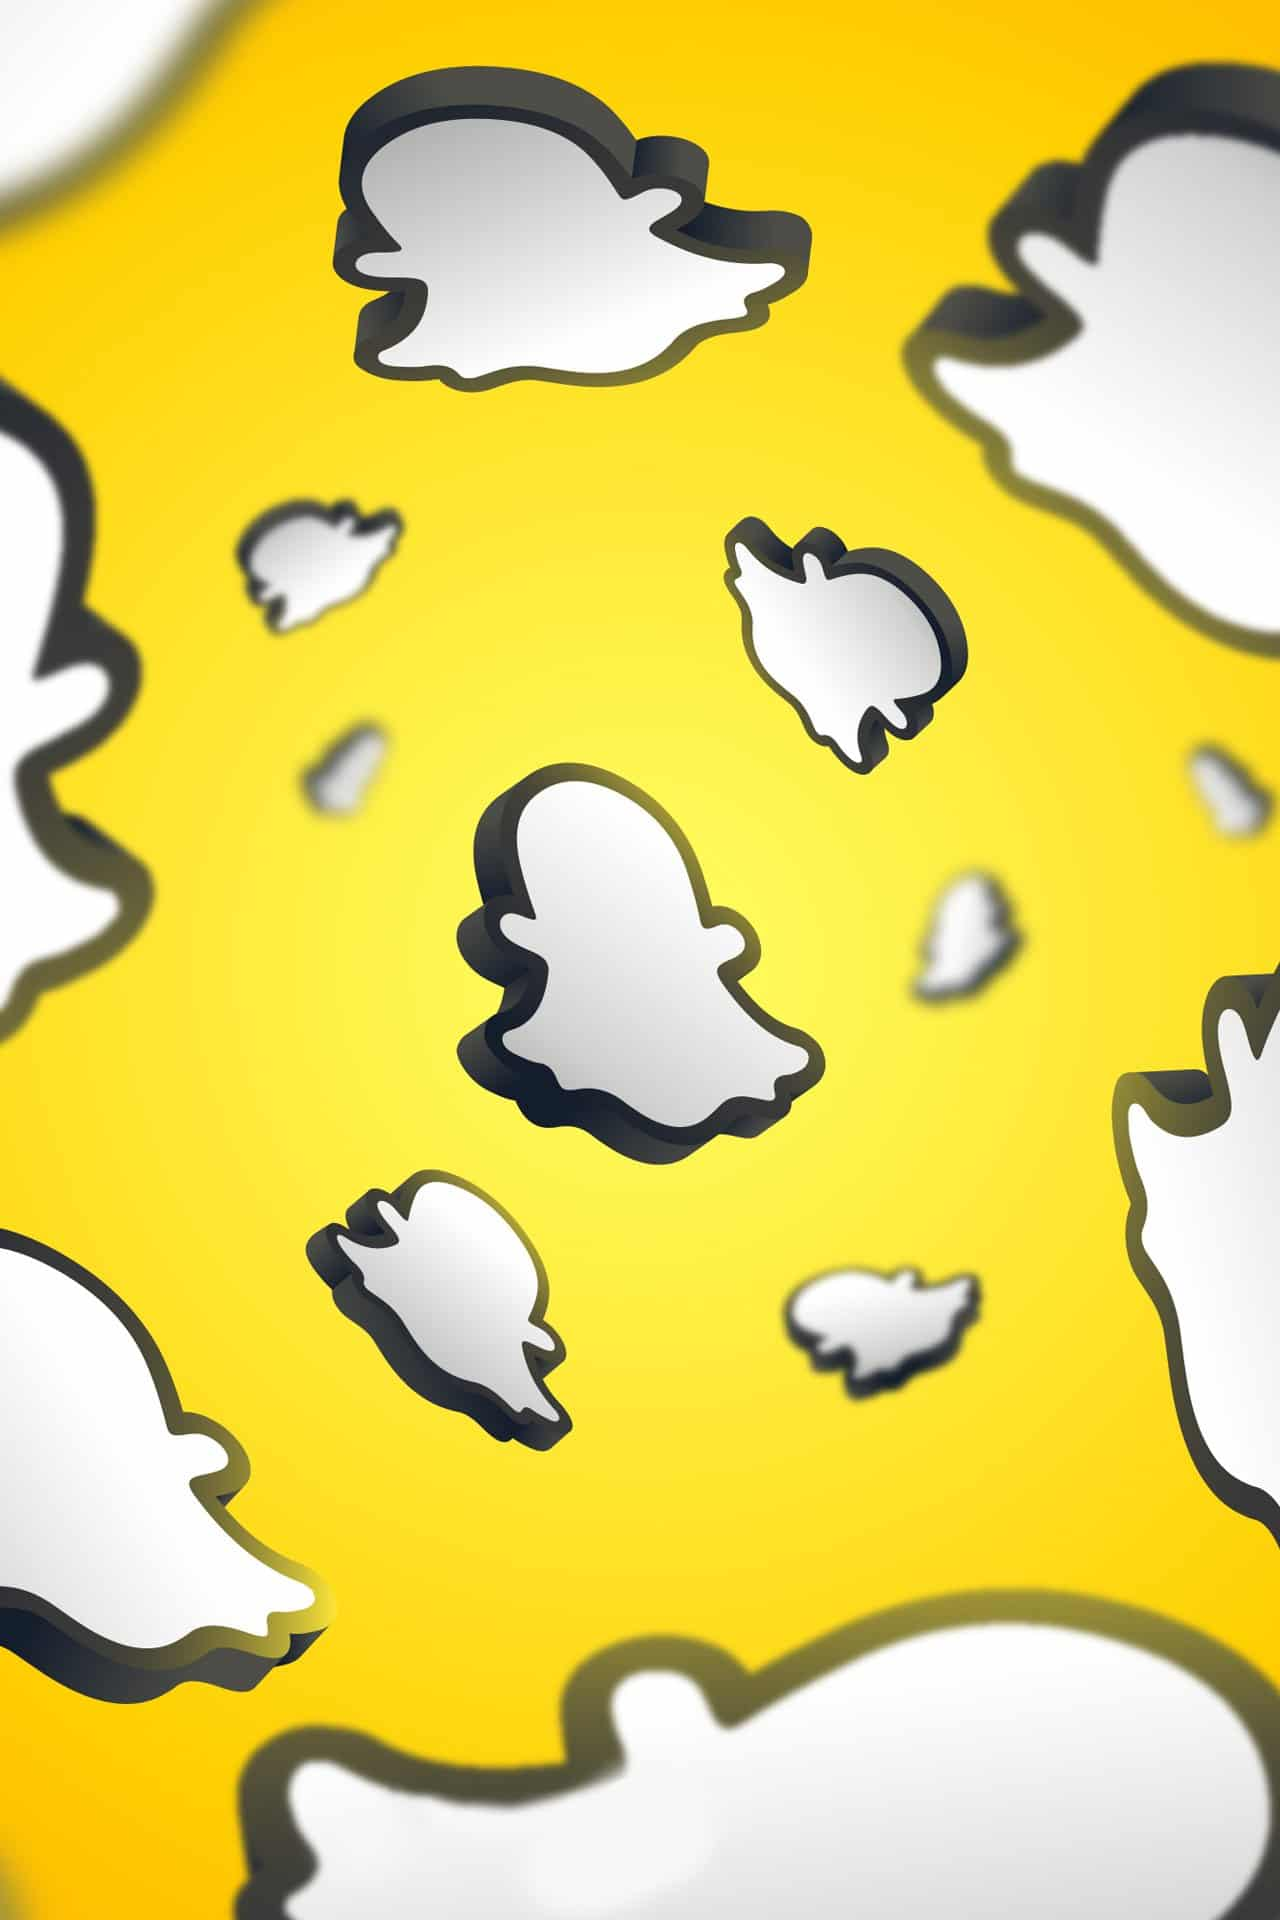 snapchat report